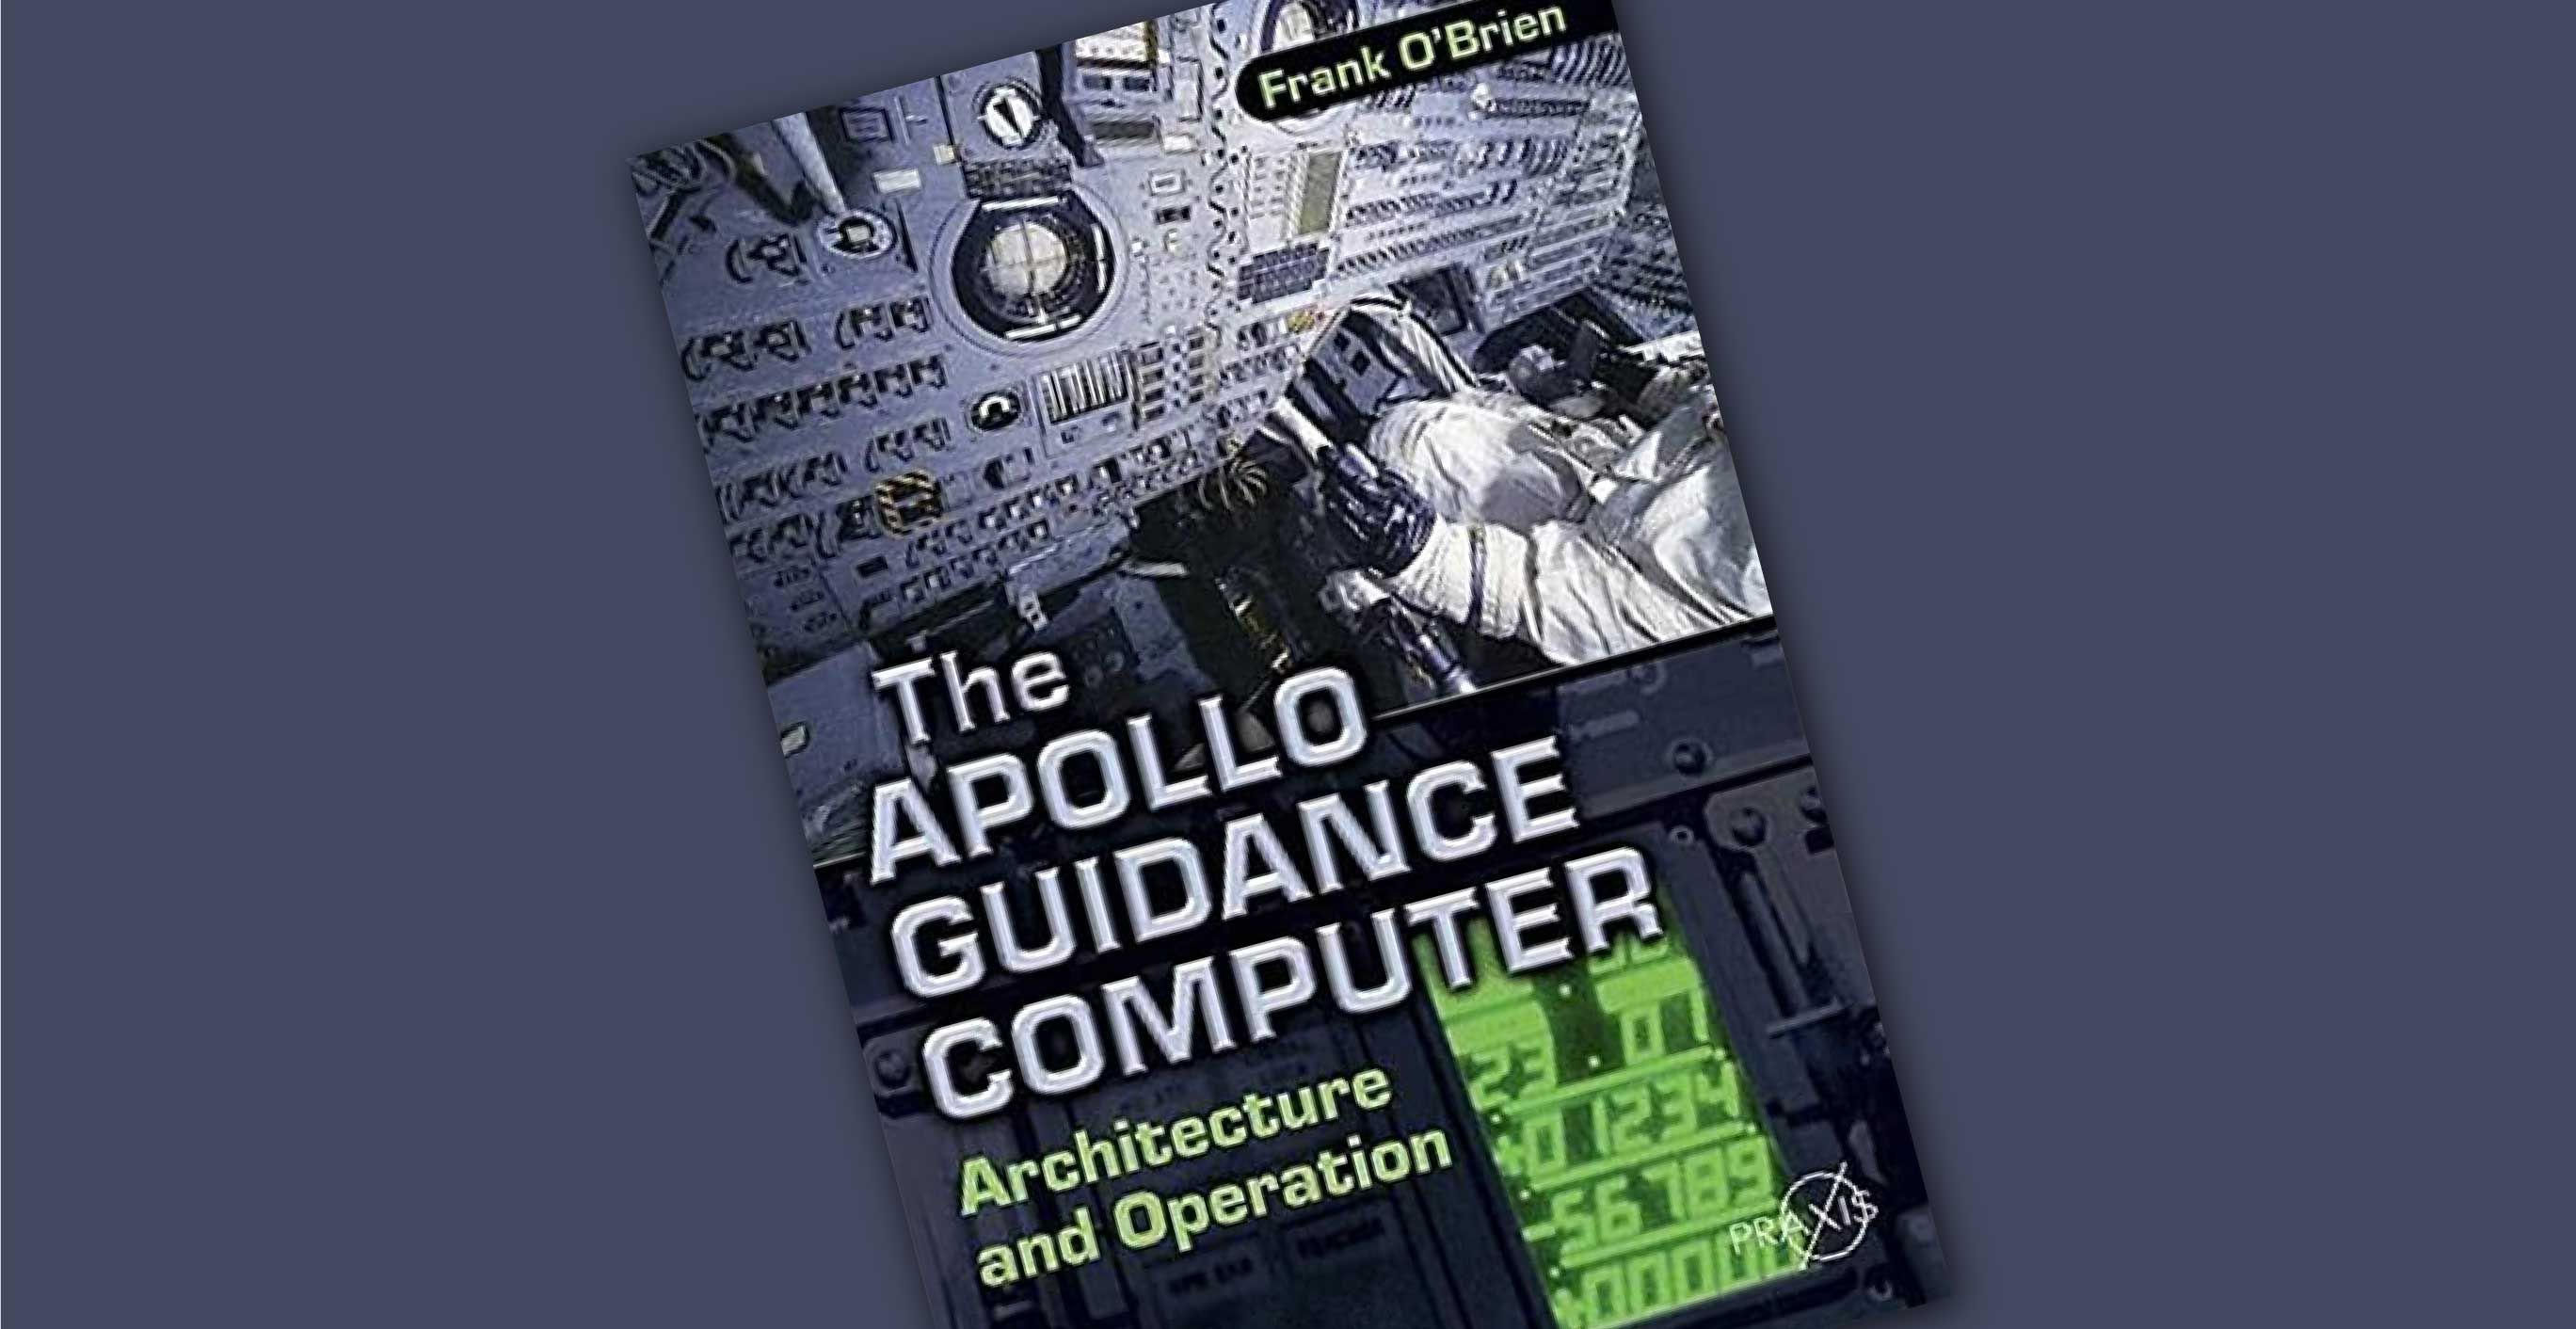 The Apollo Guidance Computer: